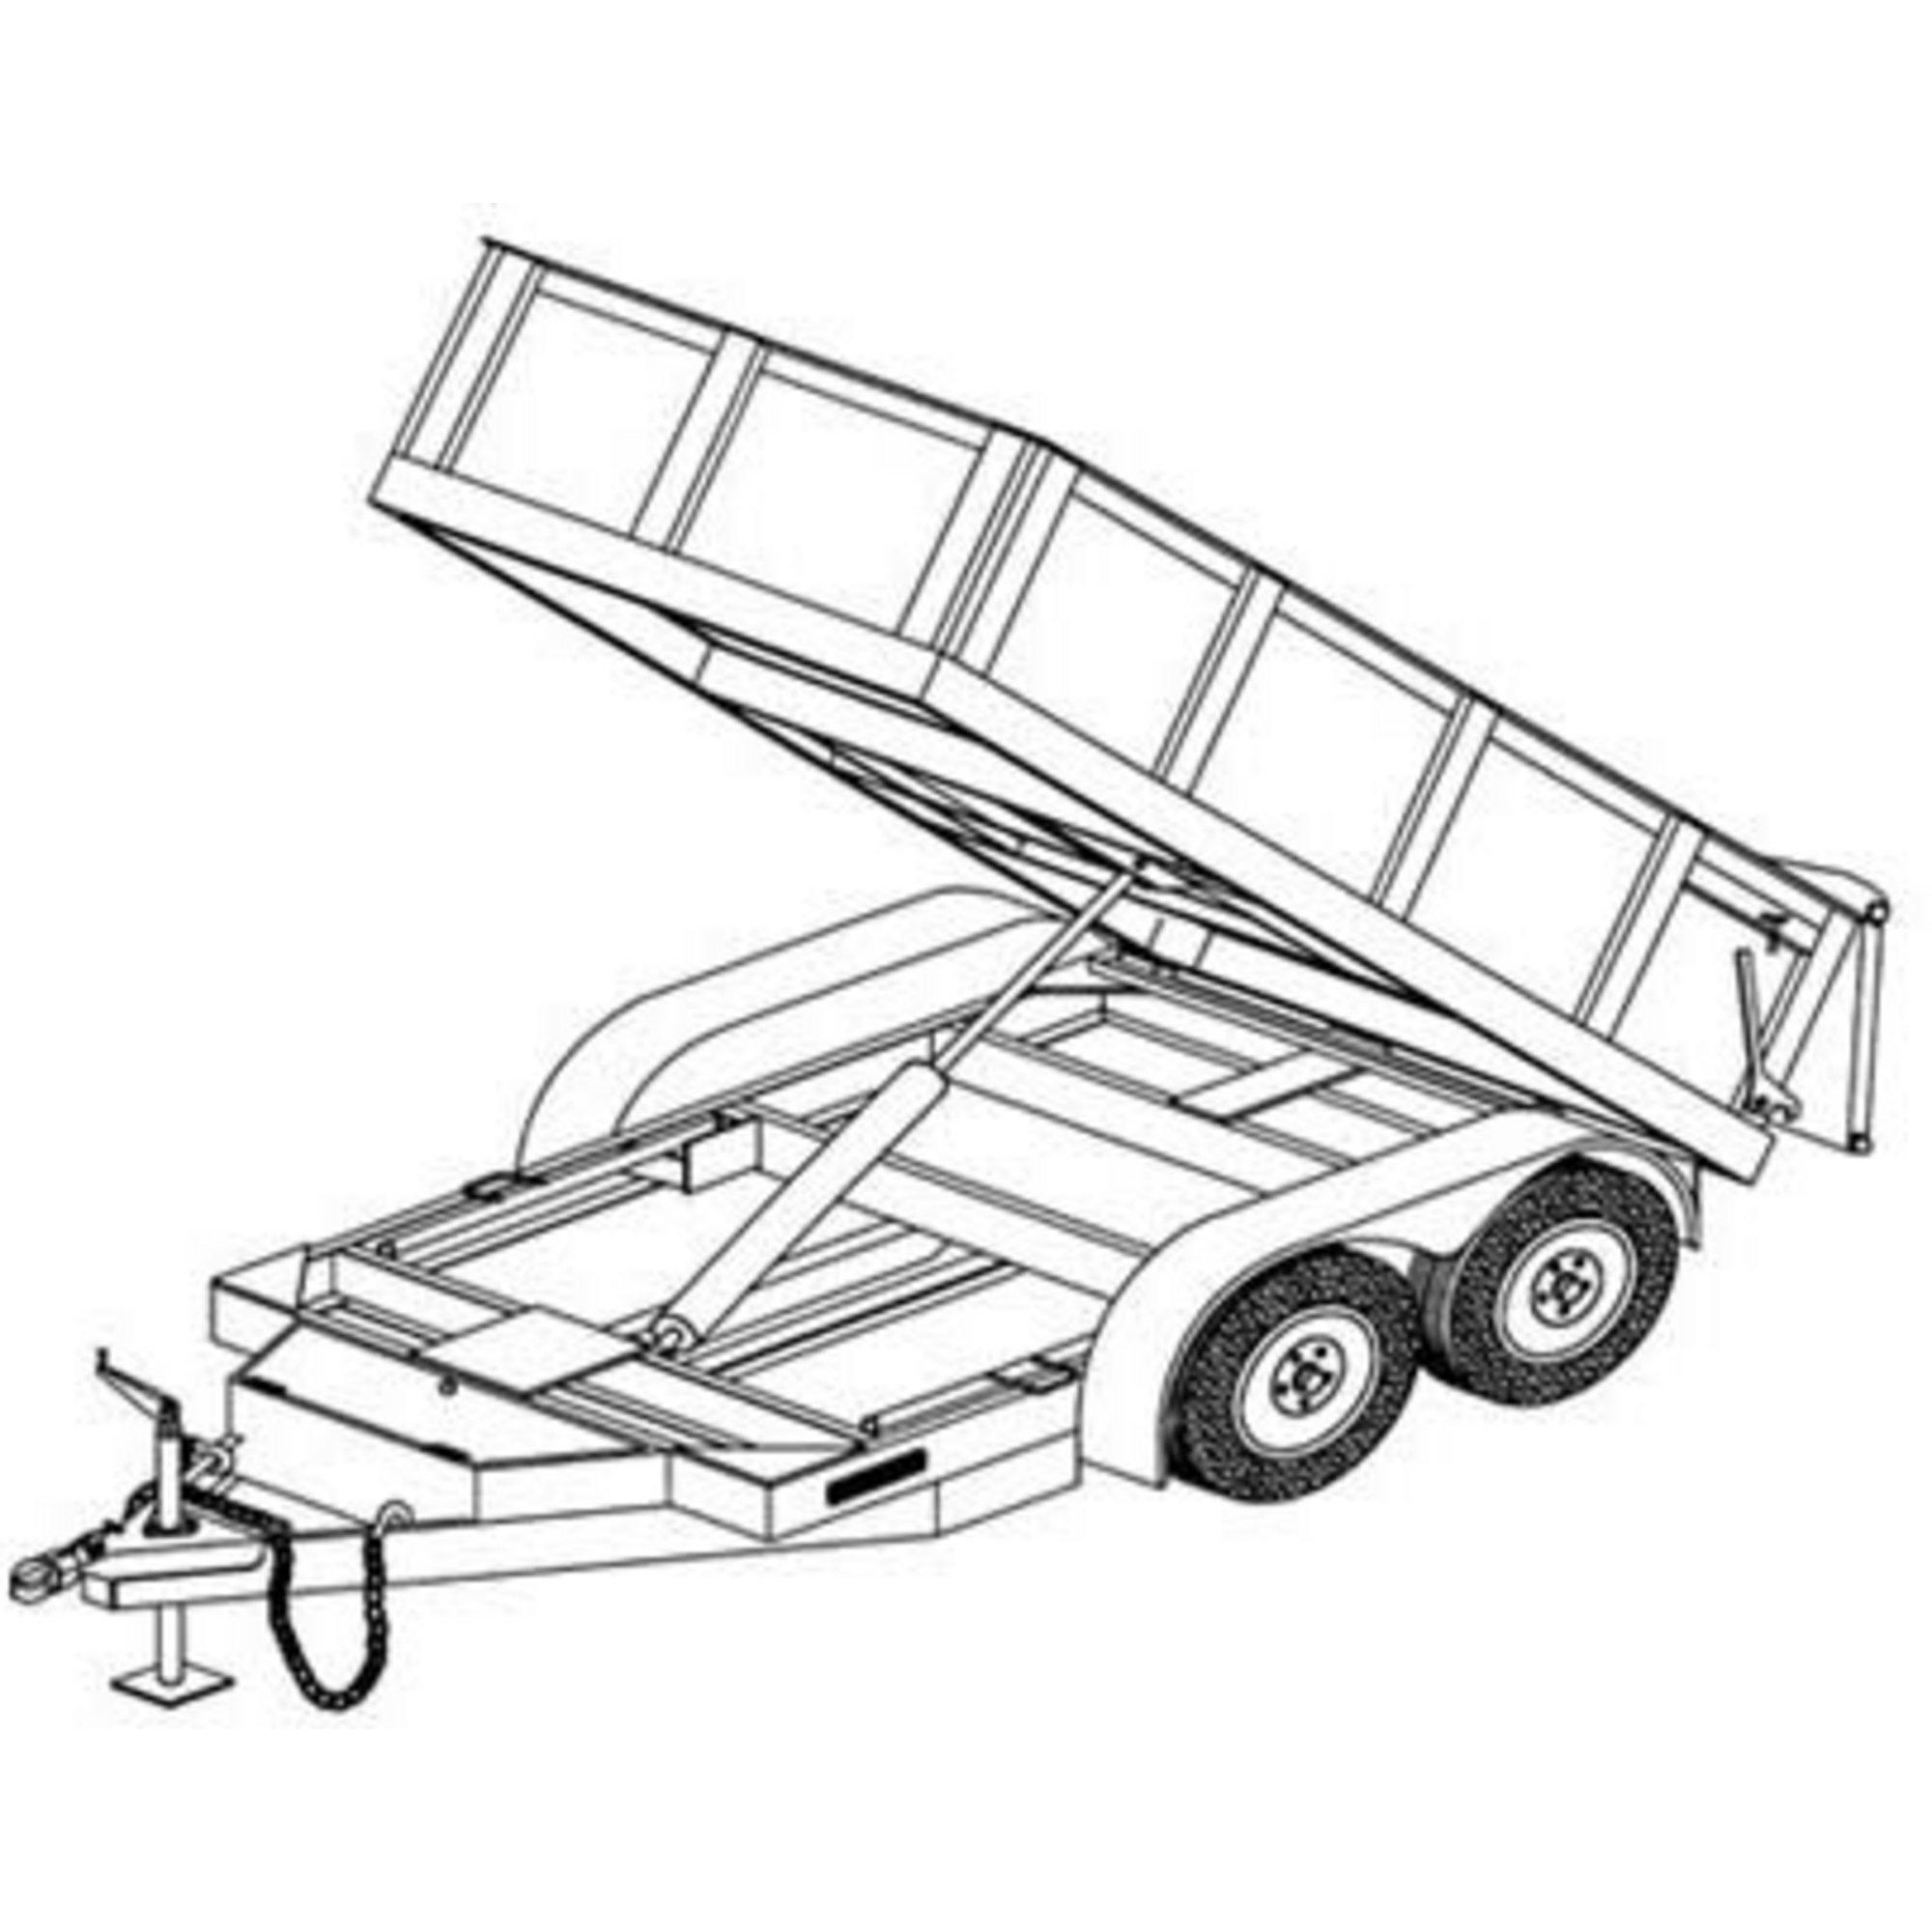 2000x2000 Hydraulic Dump Trailer Blueprints Northern Tool + Equipment